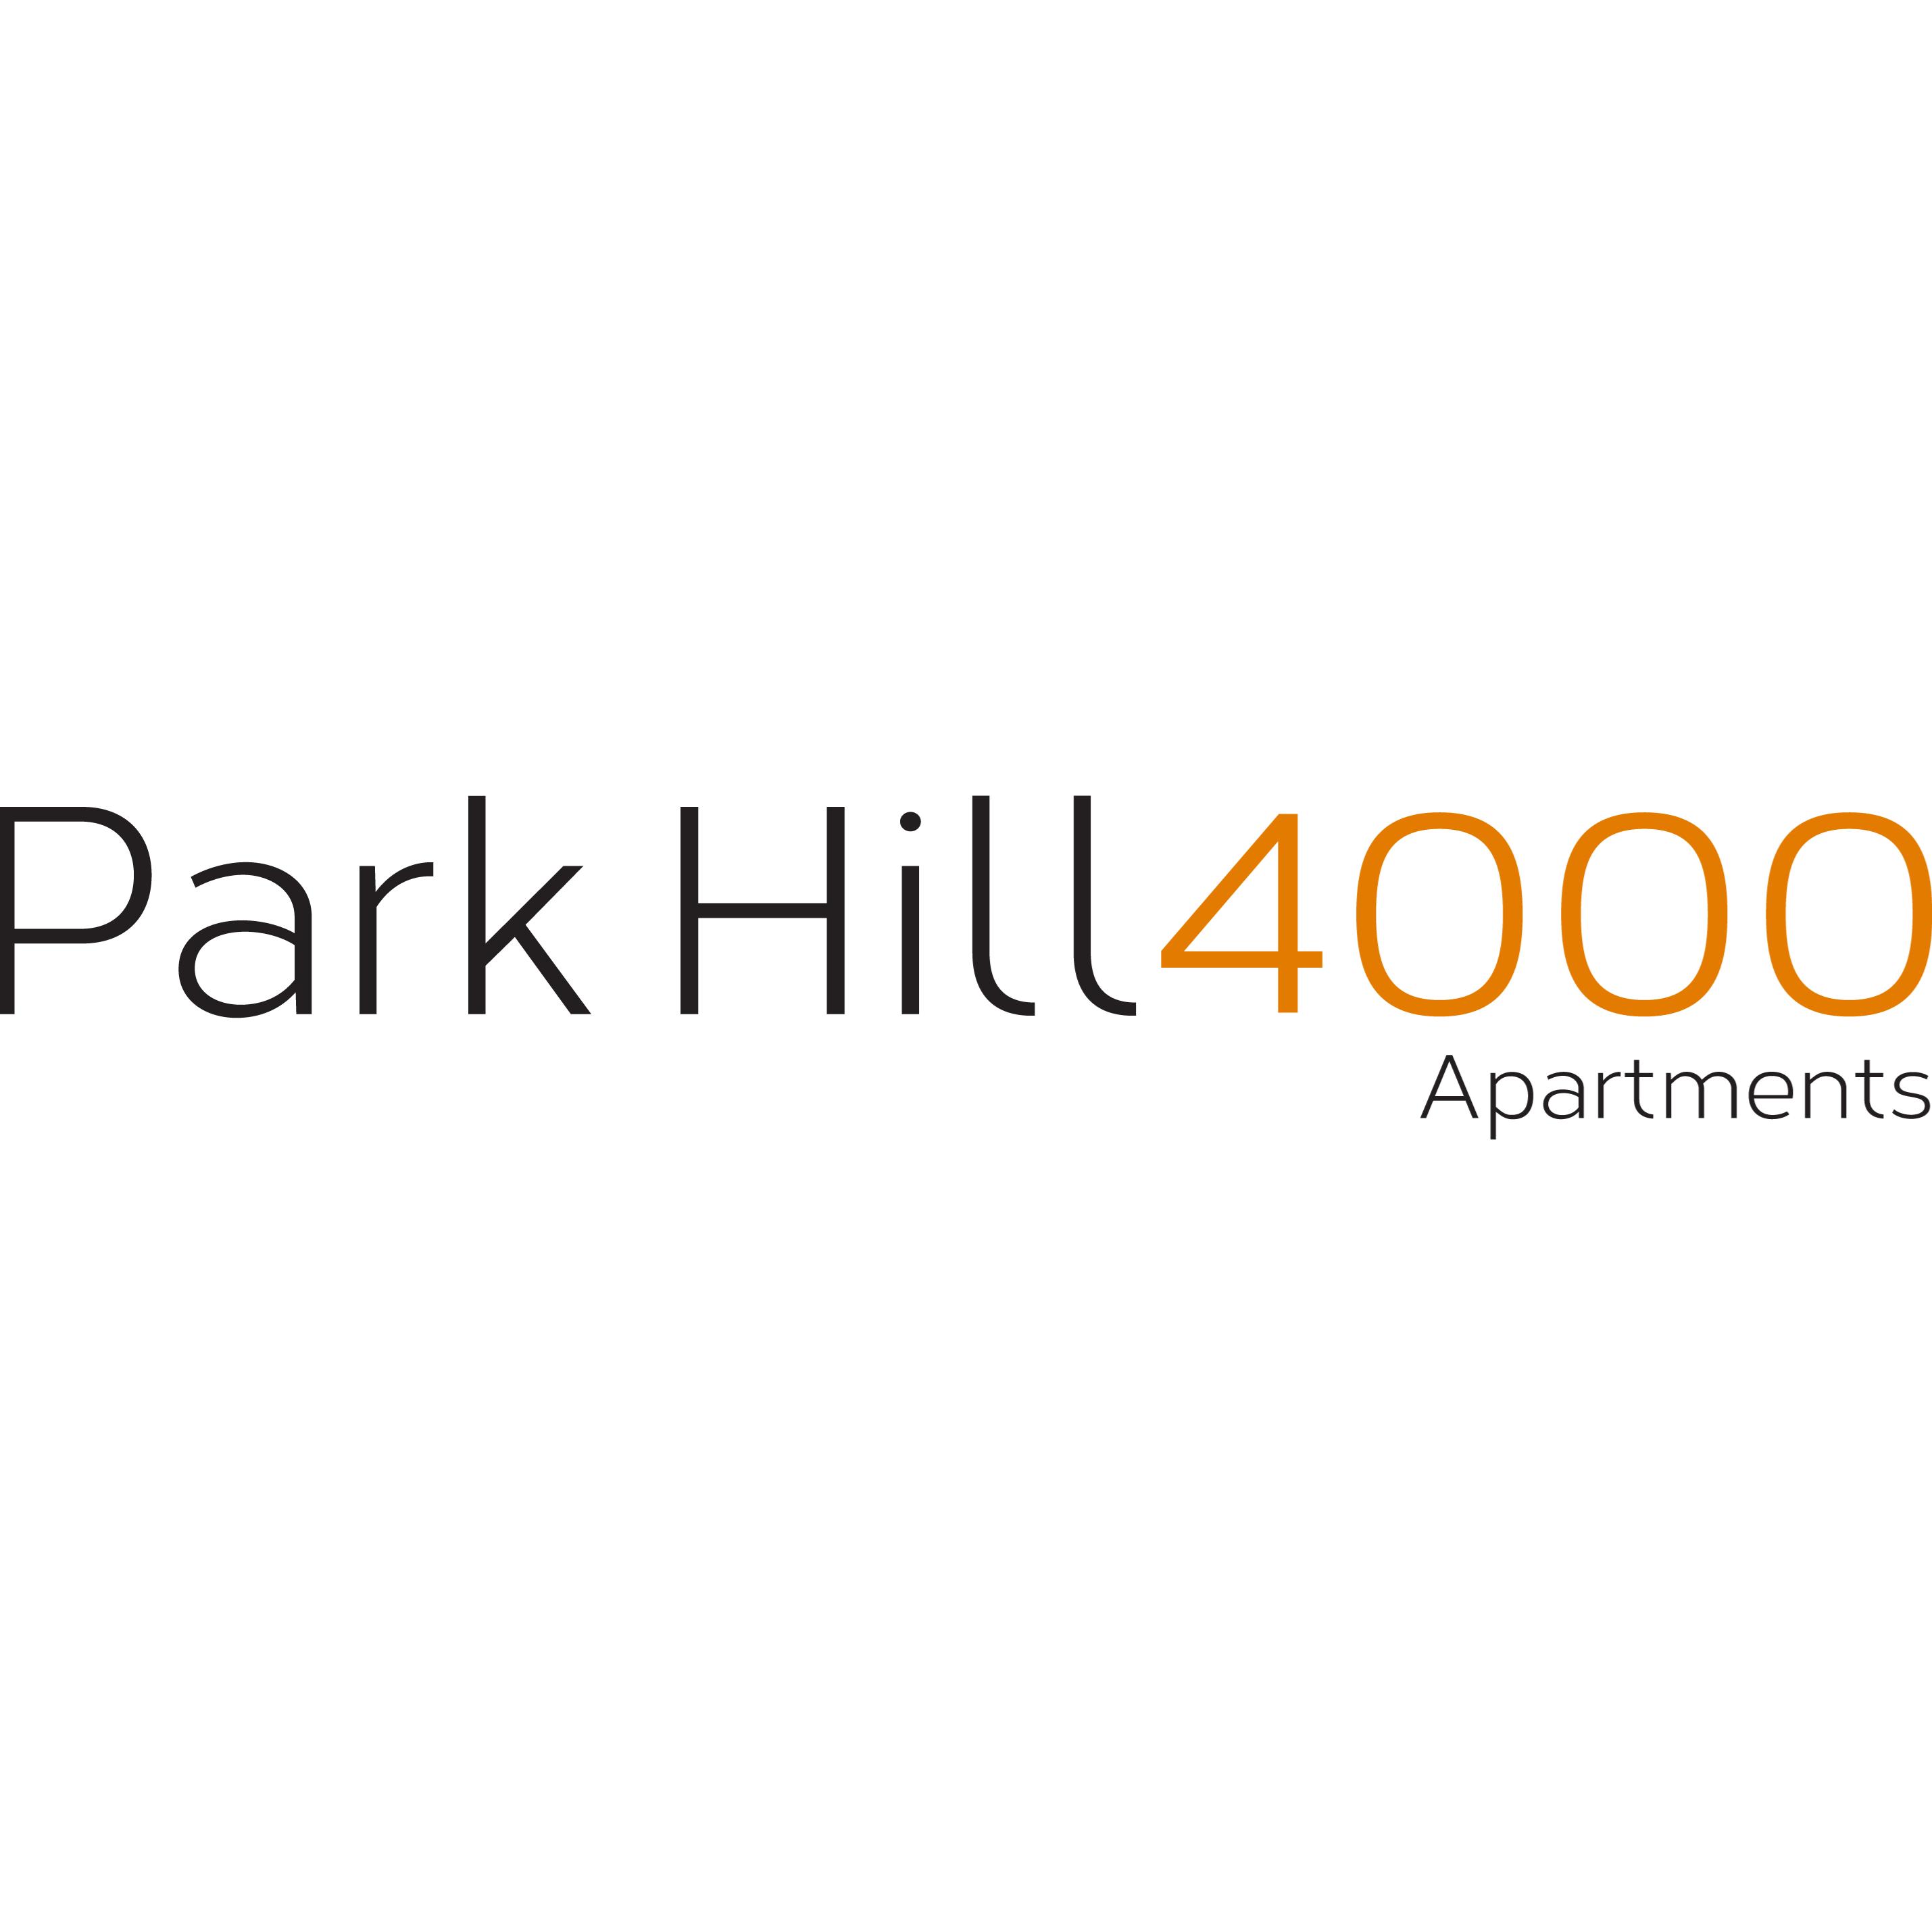 Park Hill 4000